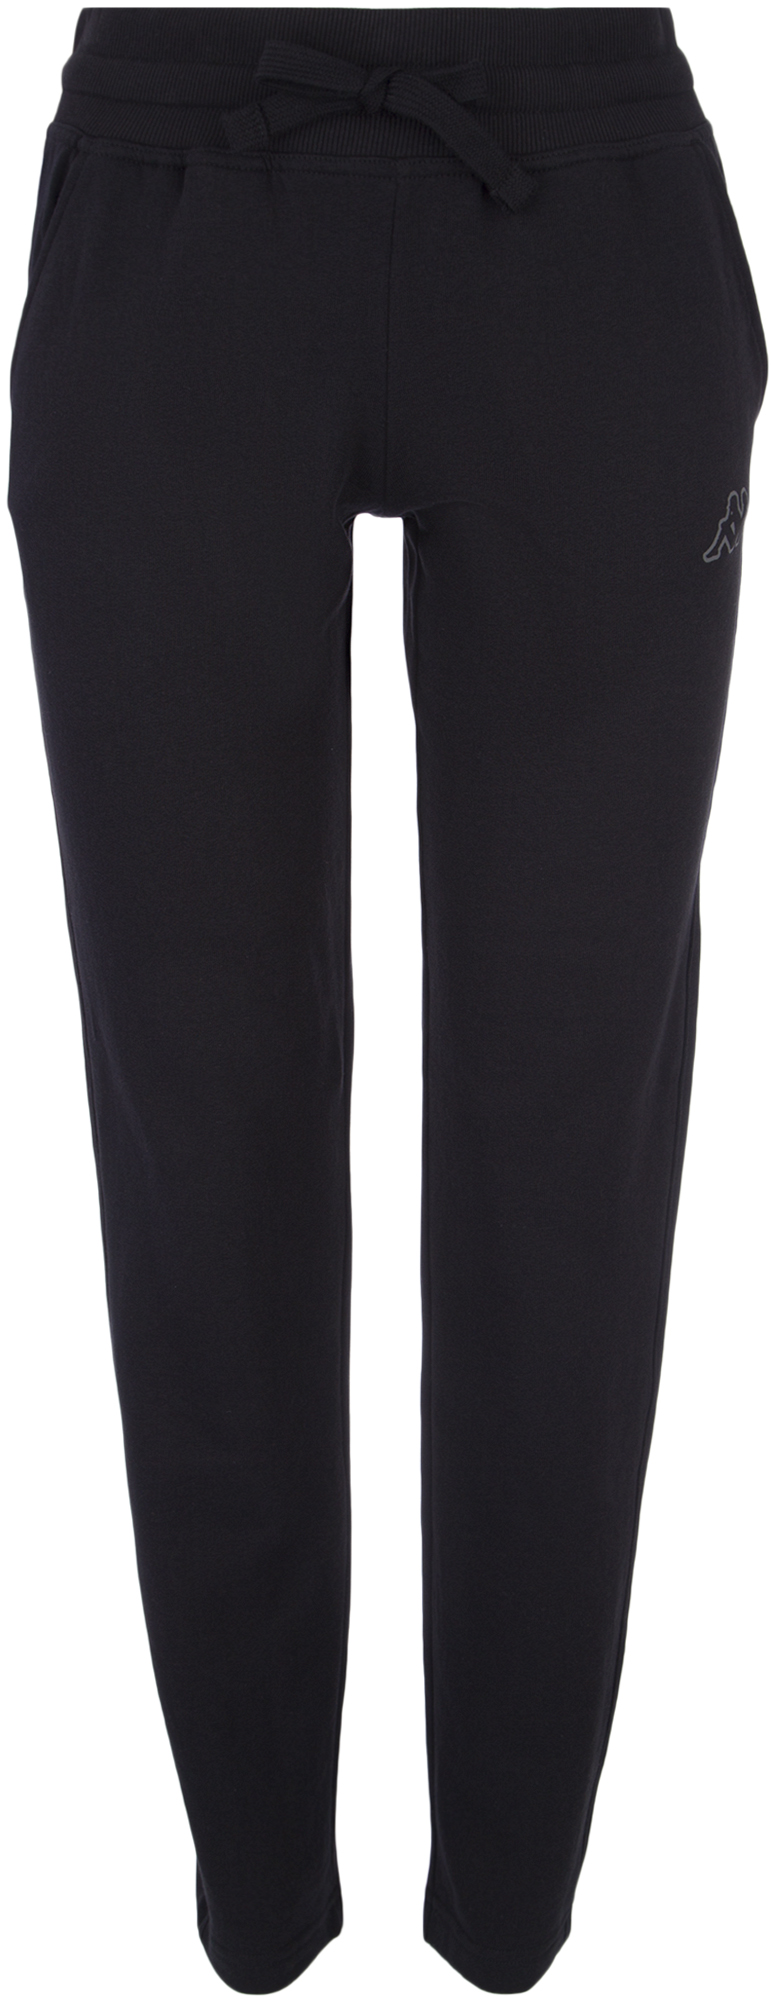 Kappa Брюки женские Kappa, размер 52 брюки женские kappa цвет милитари 3032260 5o размер xs 42